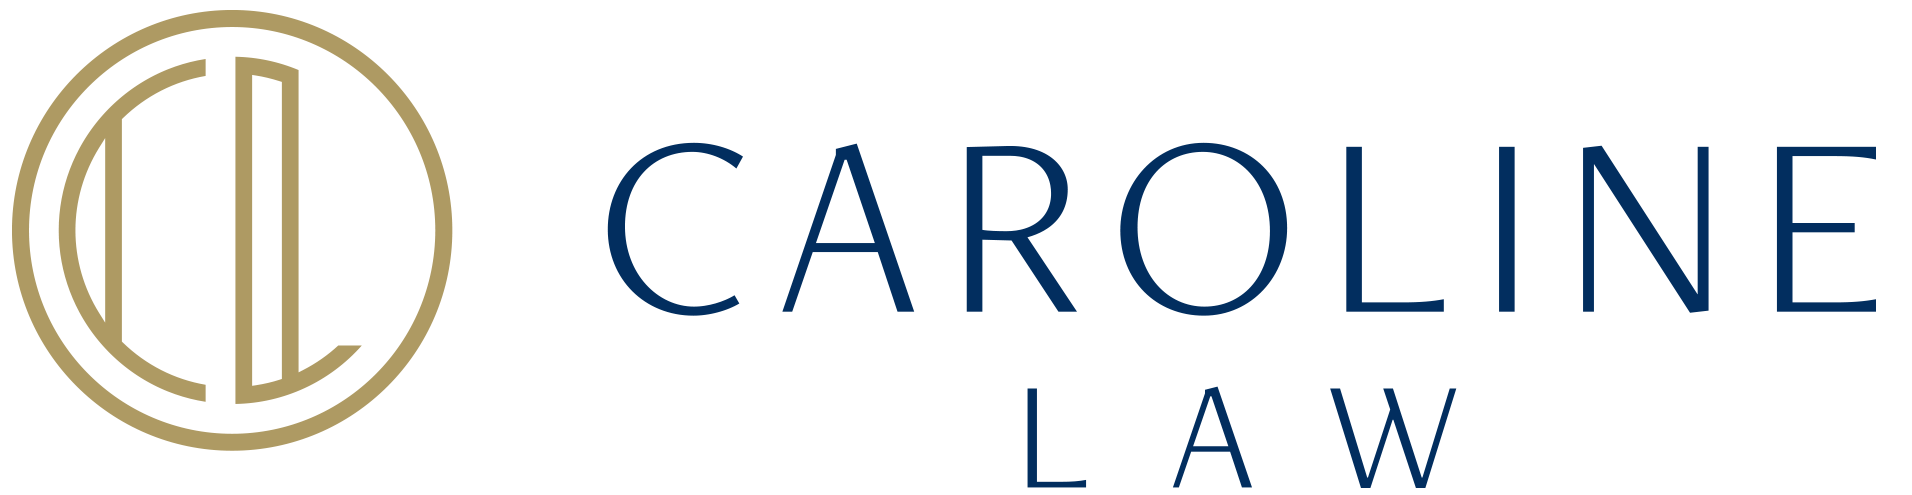 Caroline Law Corporation